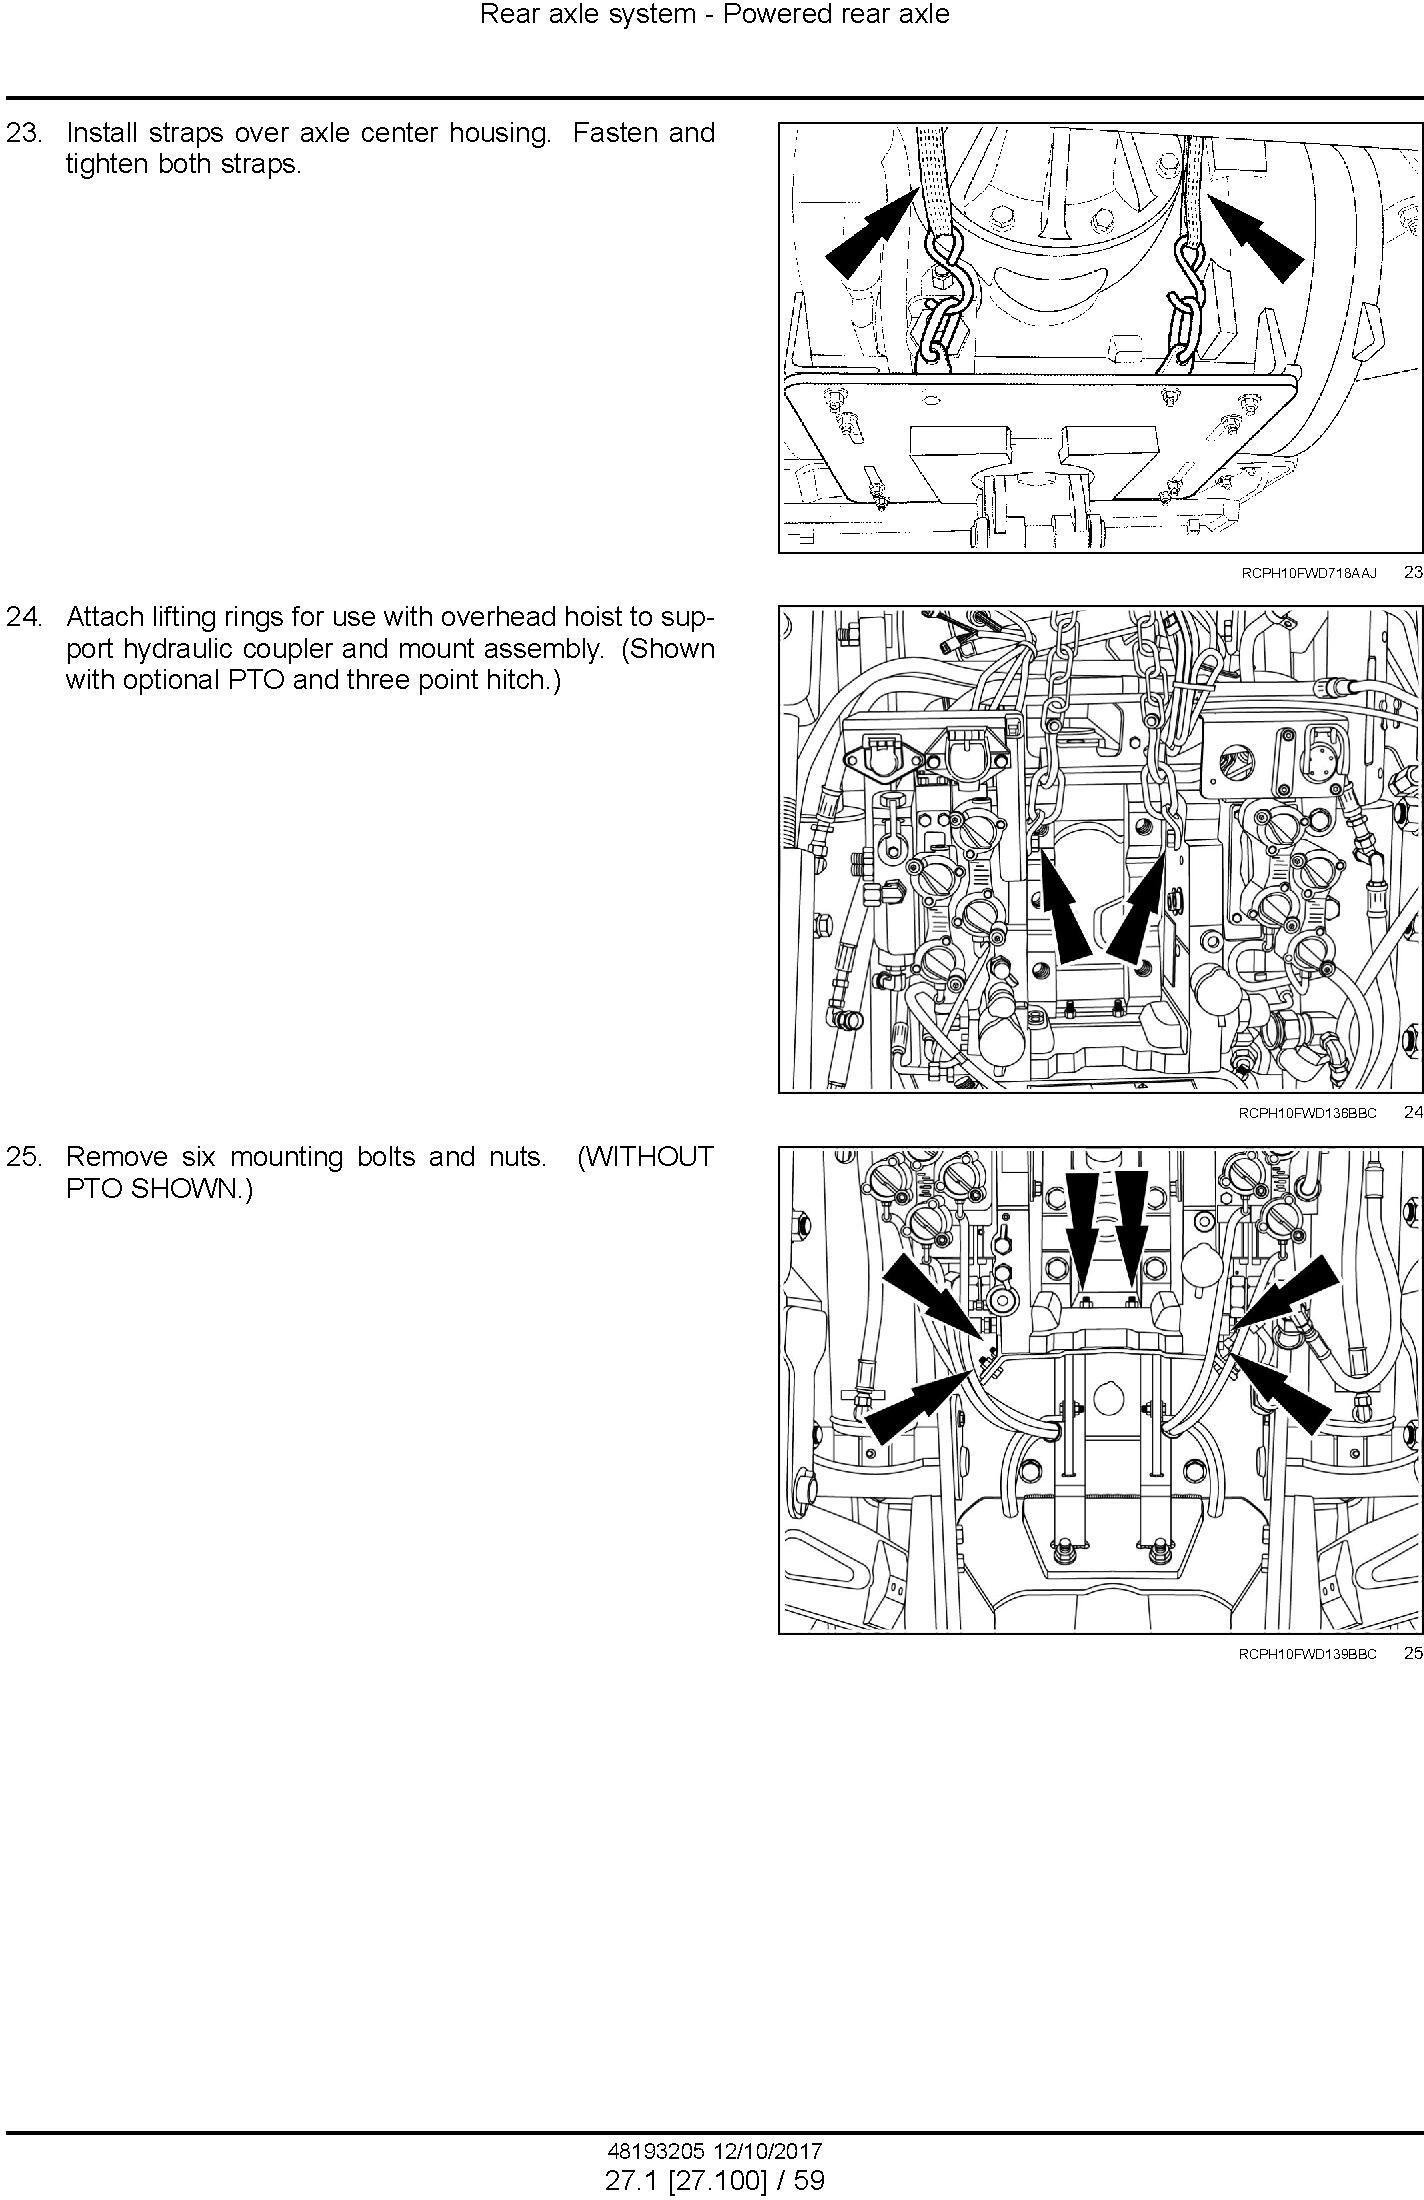 New Holland T9.435, T9.480, T9.530, T9.565, T9.600, T9.645, T9.700 Tier4B fin Tractor Service Manual - 3